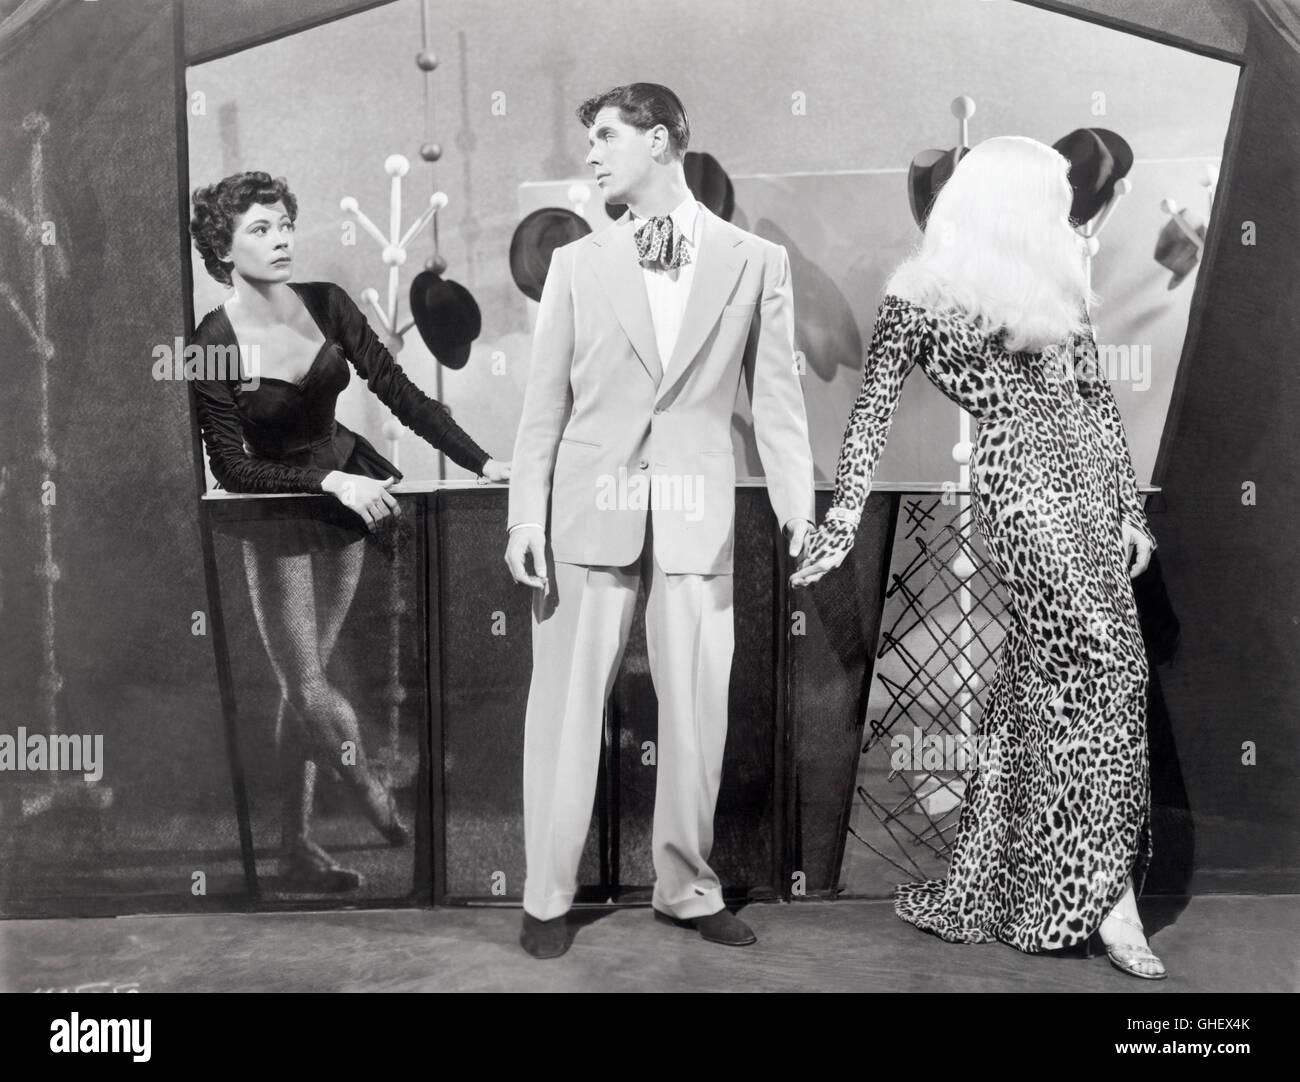 GENE KELLY INVITATION TO DANCE 1956 Stock Photo Royalty Free